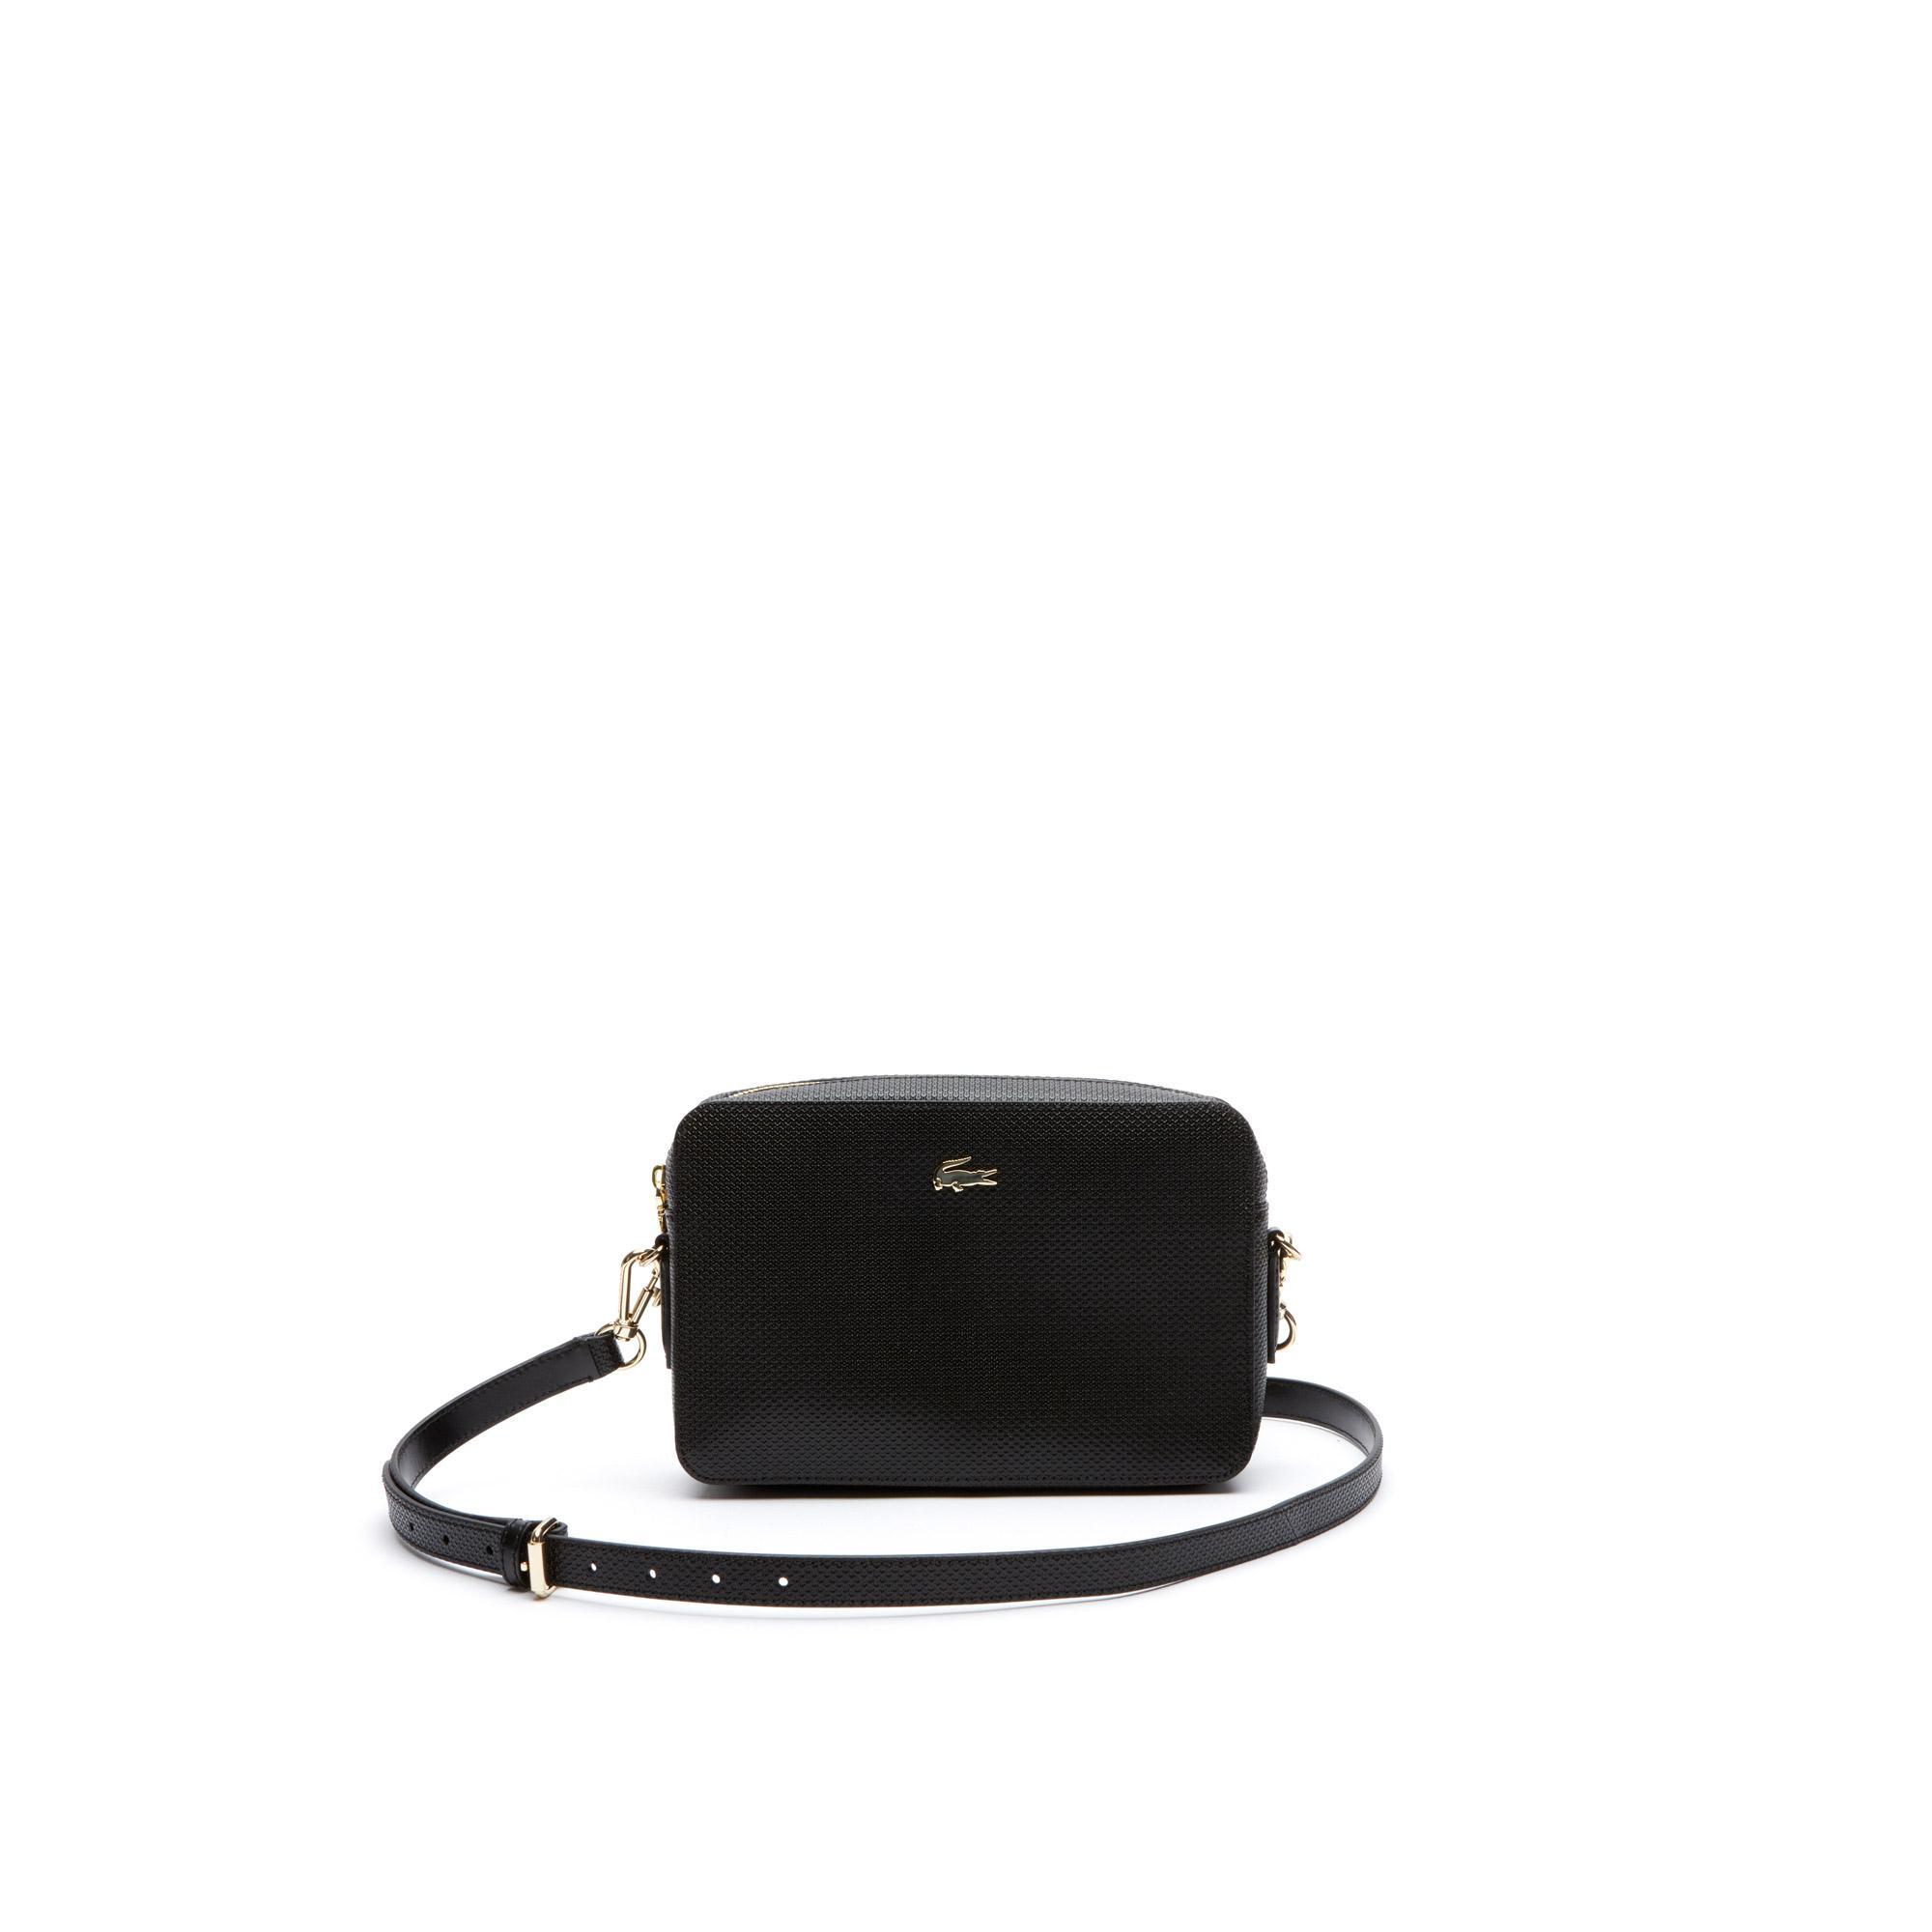 c883182c6 Lacoste Women's Bag NF2564CE 000 | lacoste.pl | Zakupy Online